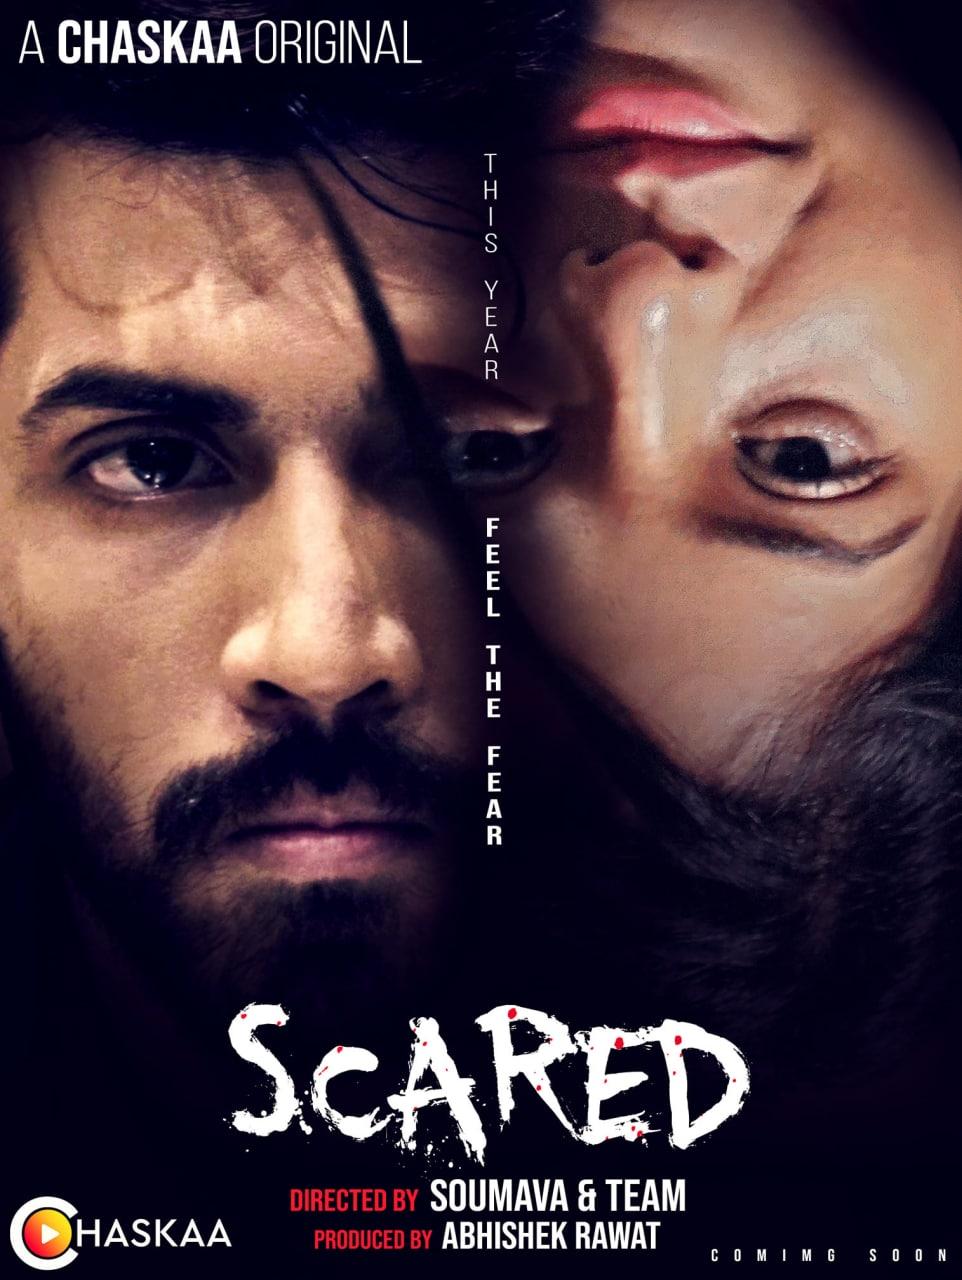 18+Scared 2021 oChaskaa Originals Hindi Short Film 720p HDRip 160MB Download